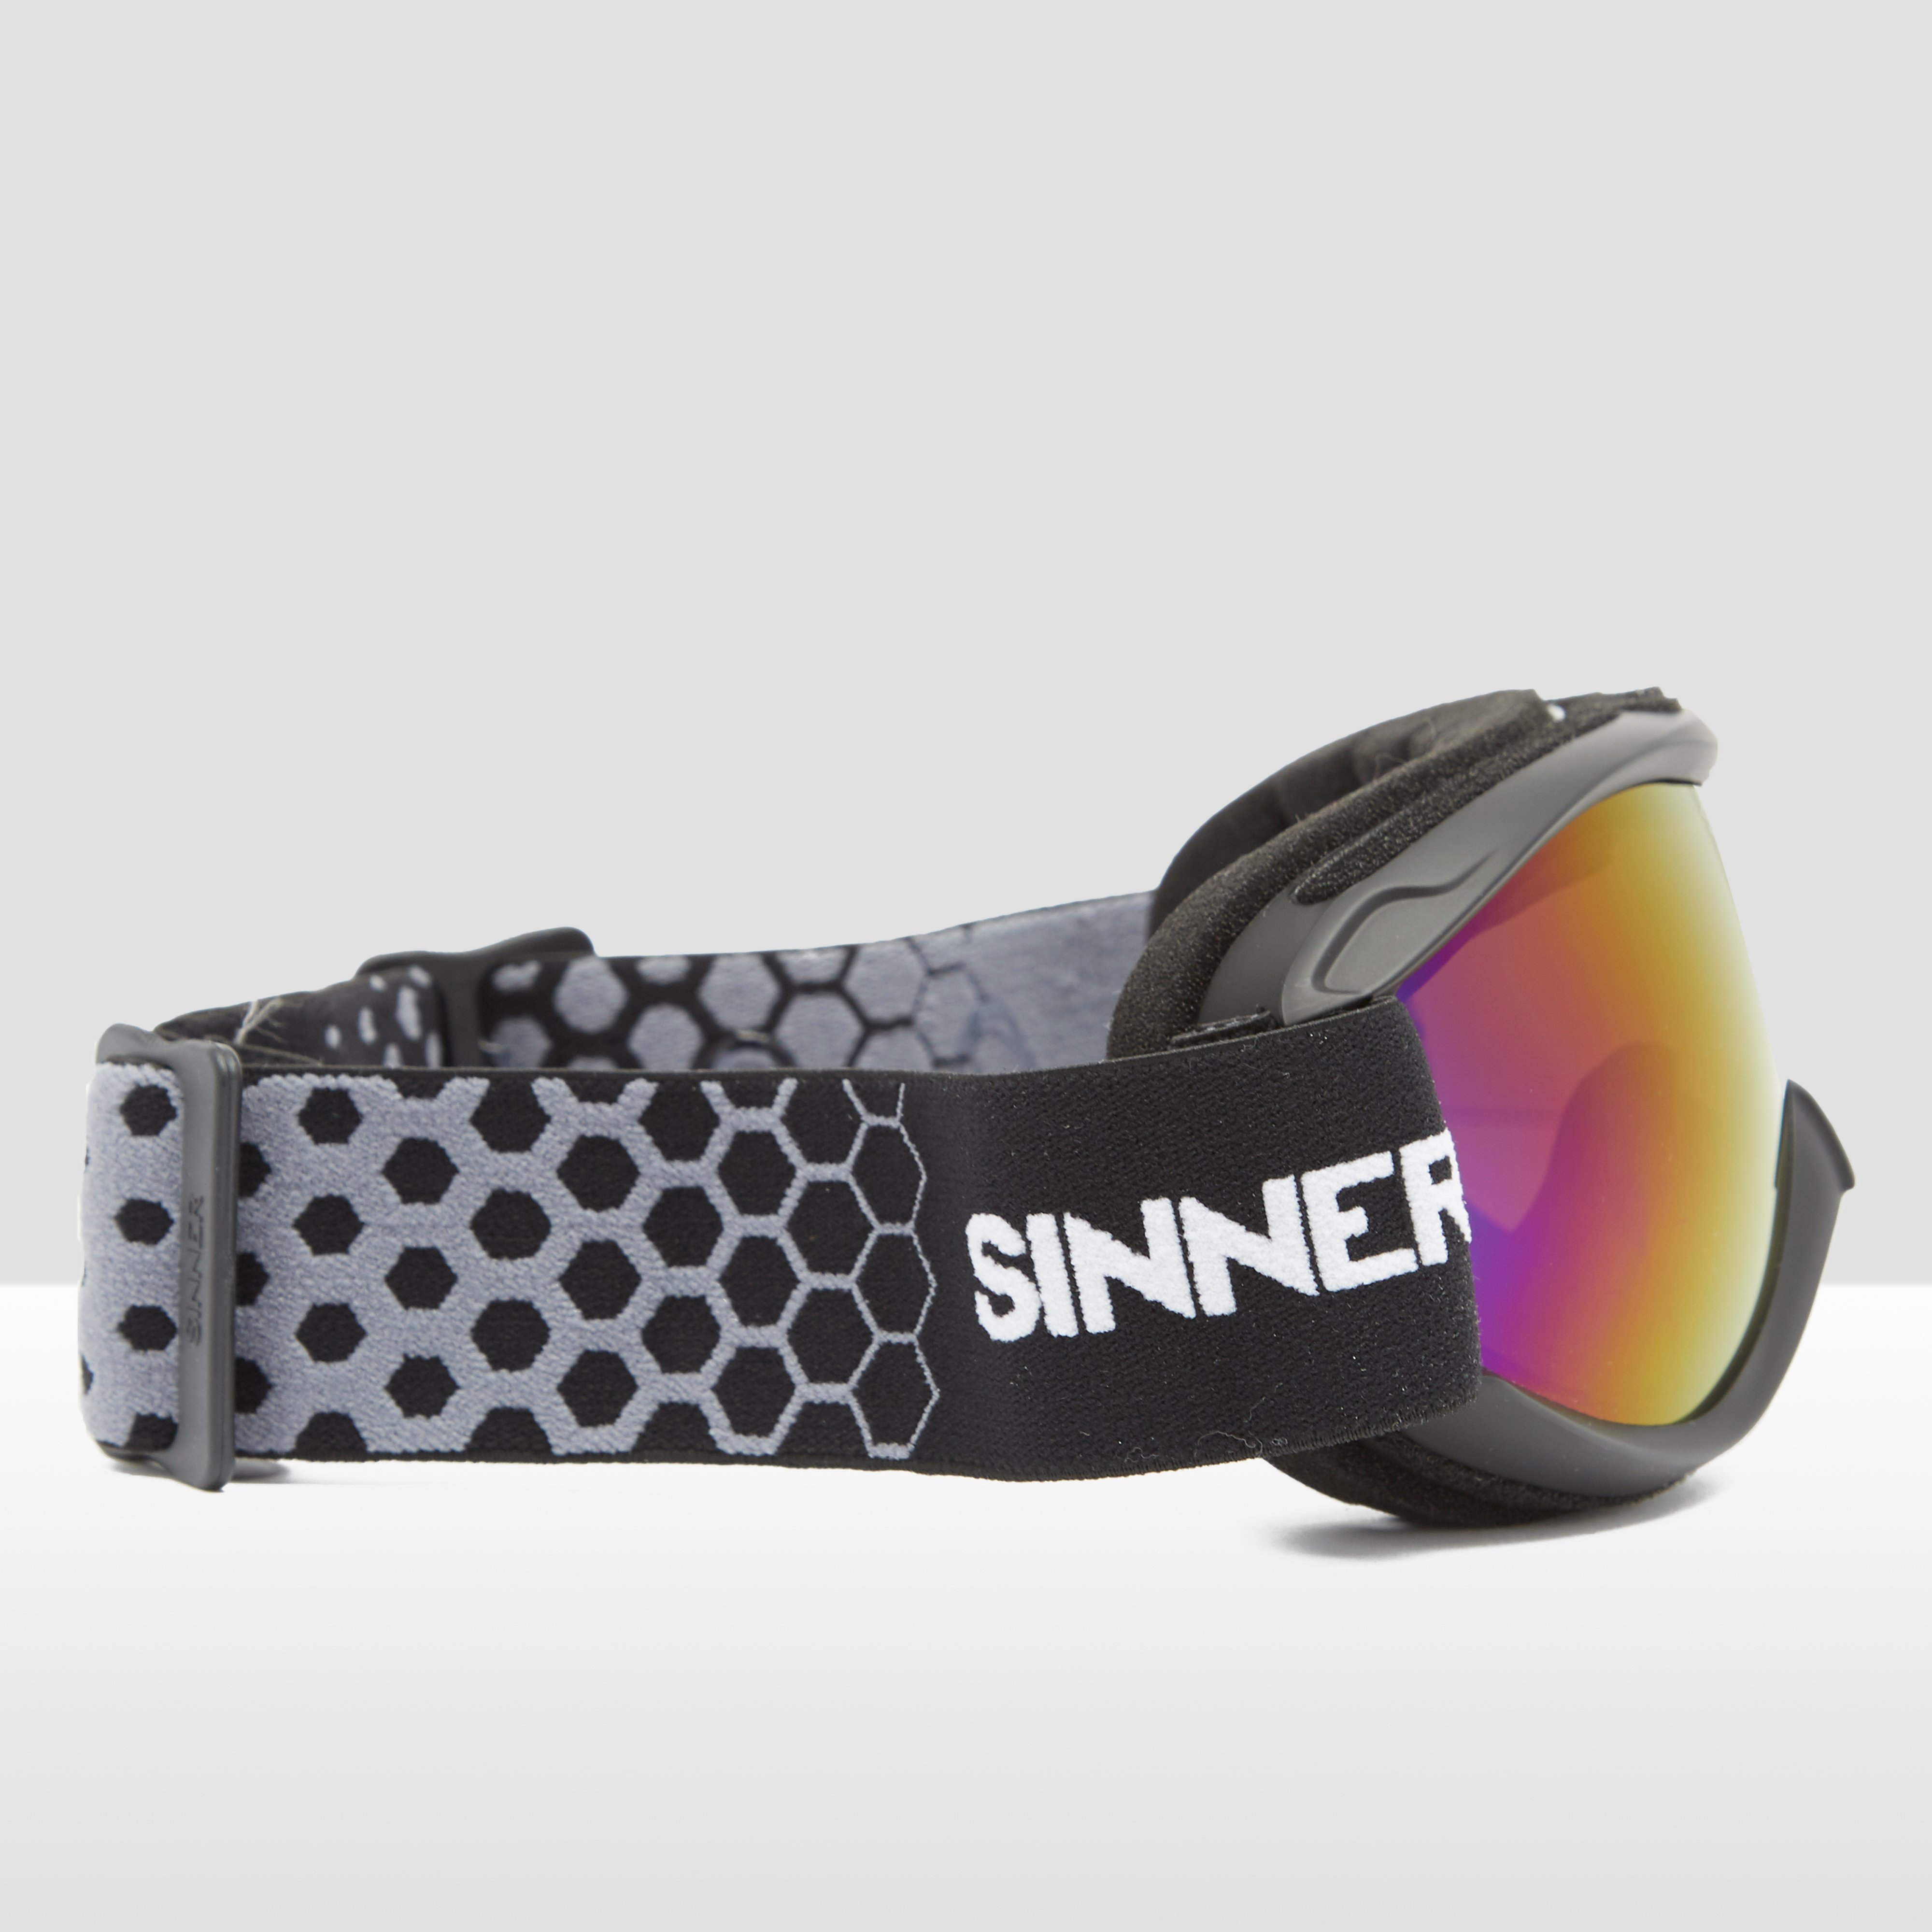 SINNER TOXIC SKIBRIL ZWART/PAARS